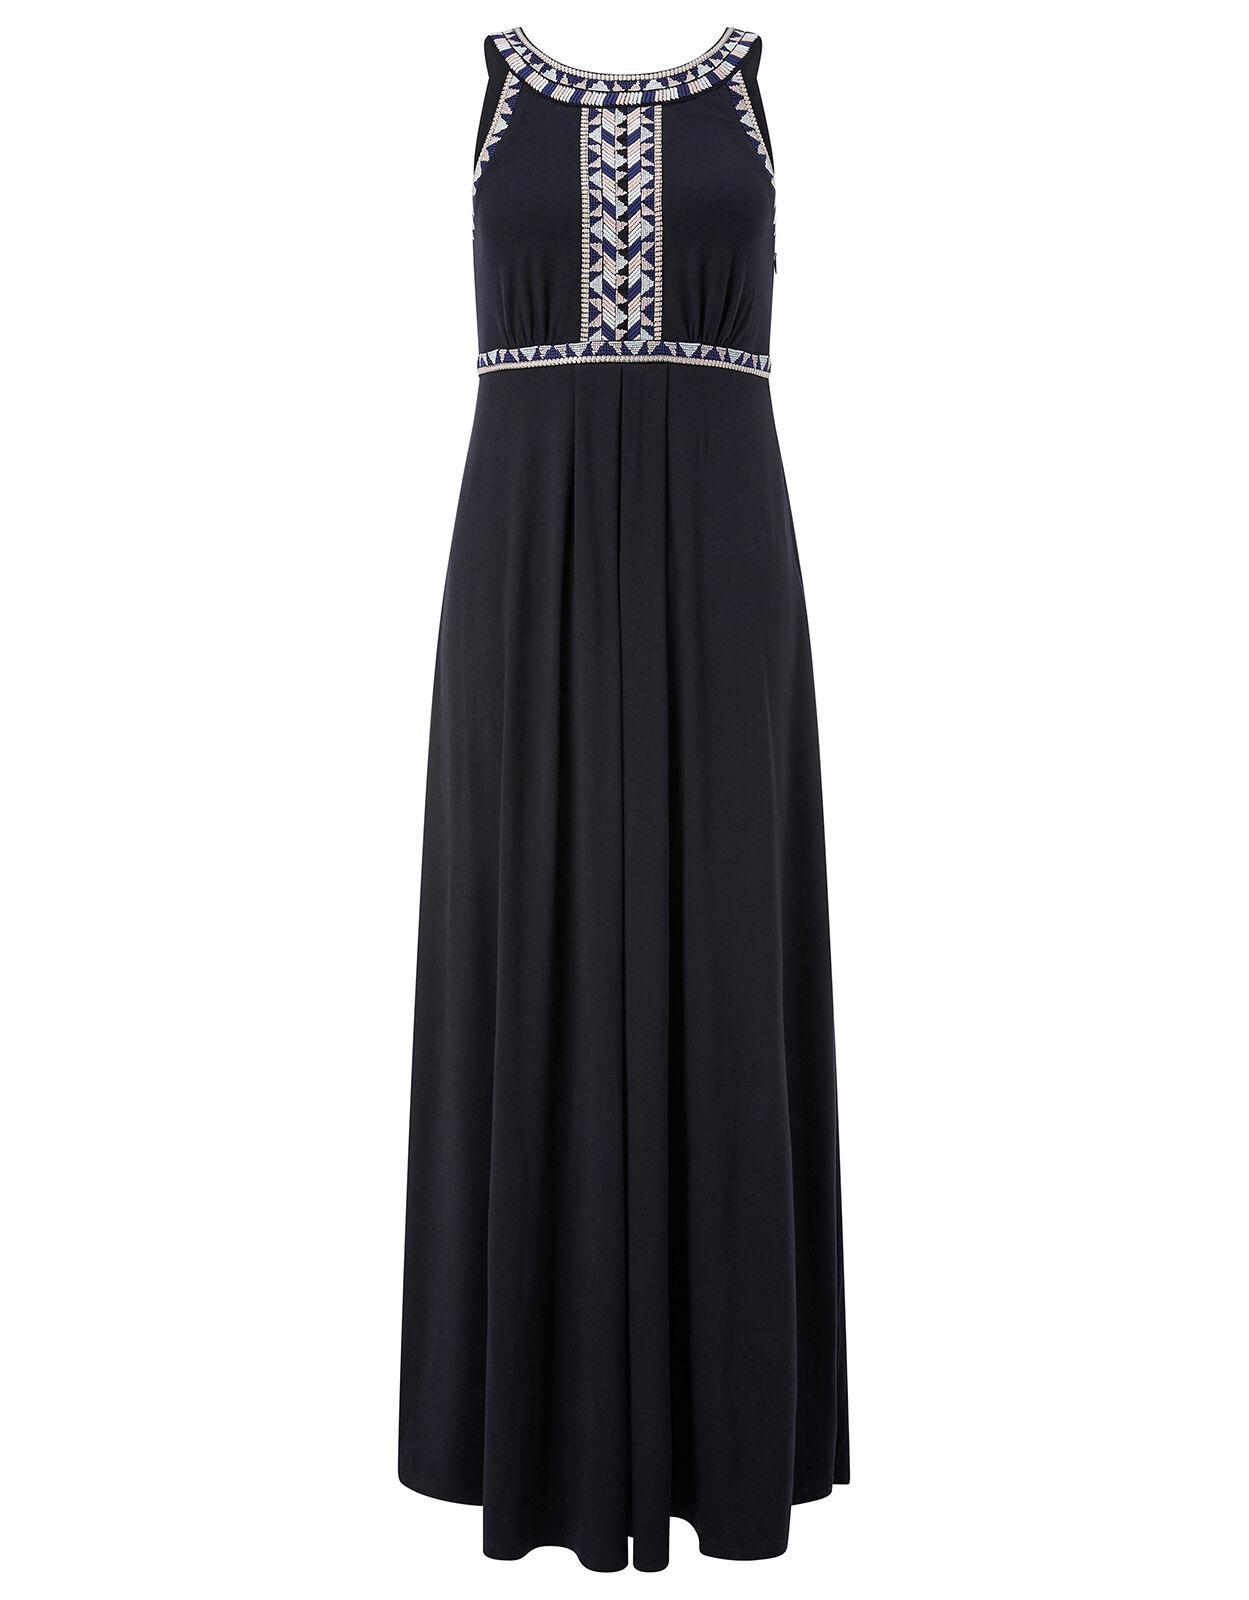 New Monsoon Emmi Embroidered Maxi Dress Dress Dress size 16 holiday beach wedding 9369dd